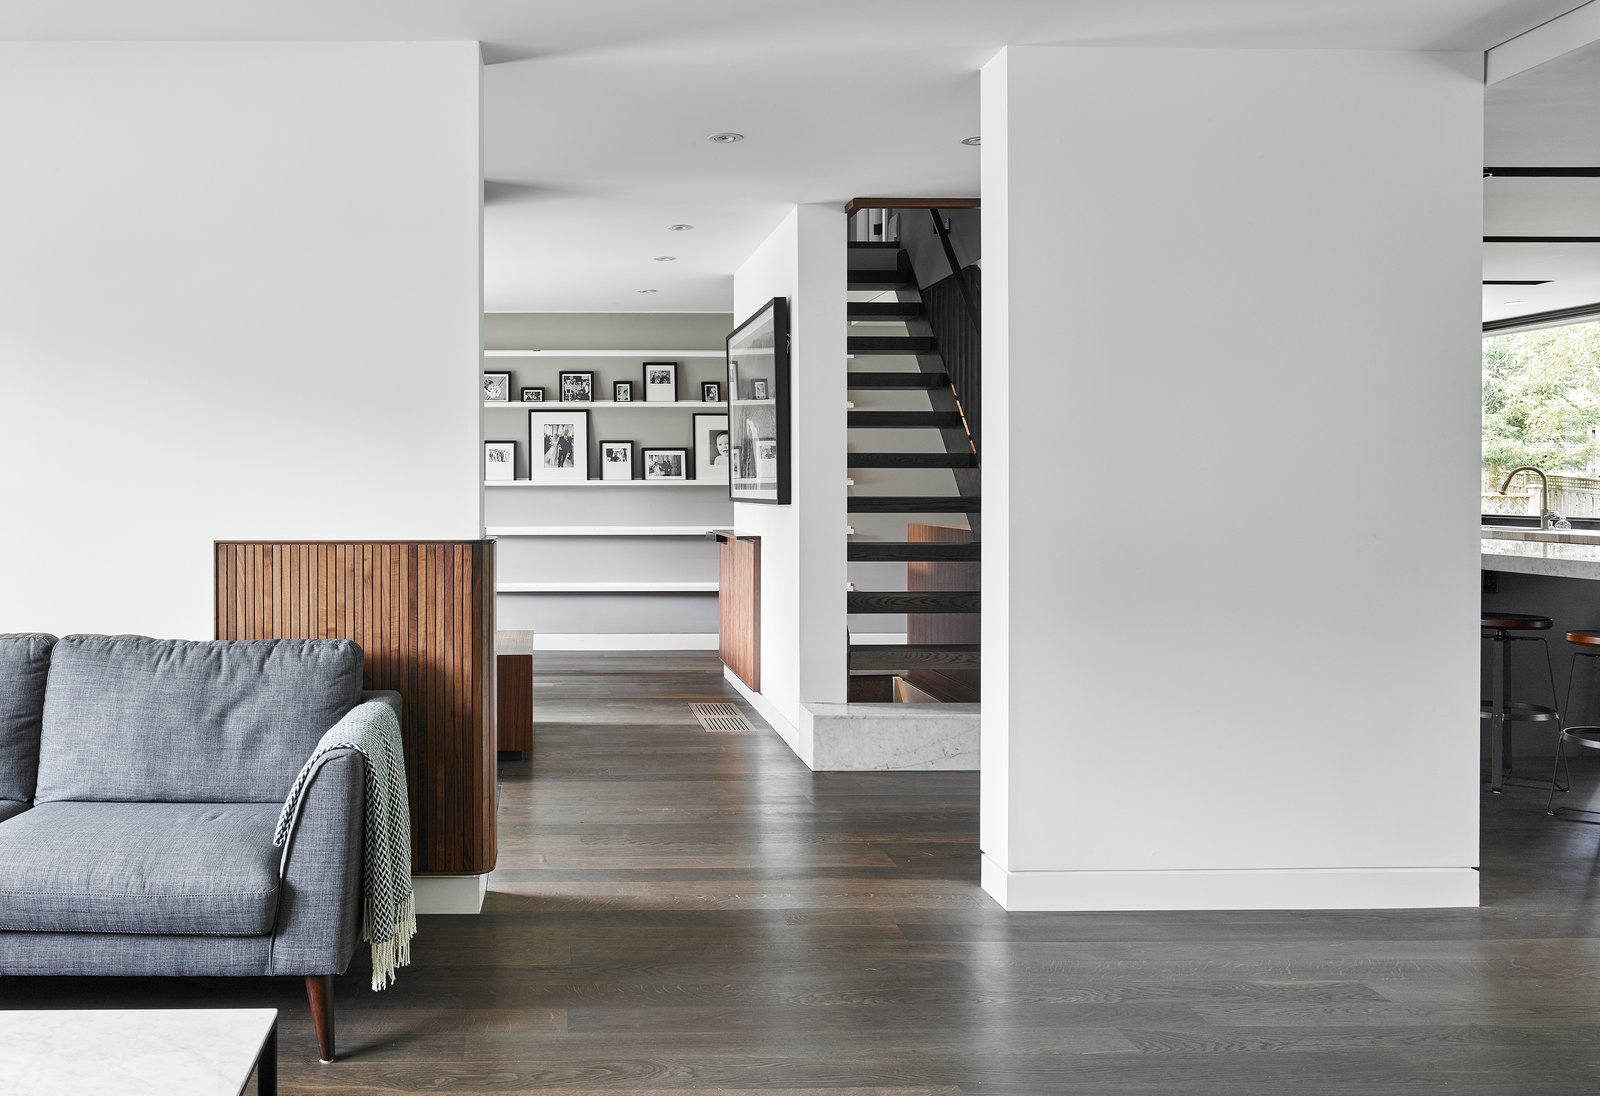 Tagged: Living Room, Sofa, Medium Hardwood Floor, Recessed Lighting, Coffee Tables, and Shelves.  Hibou House by Barbora Vokac Taylor Architect